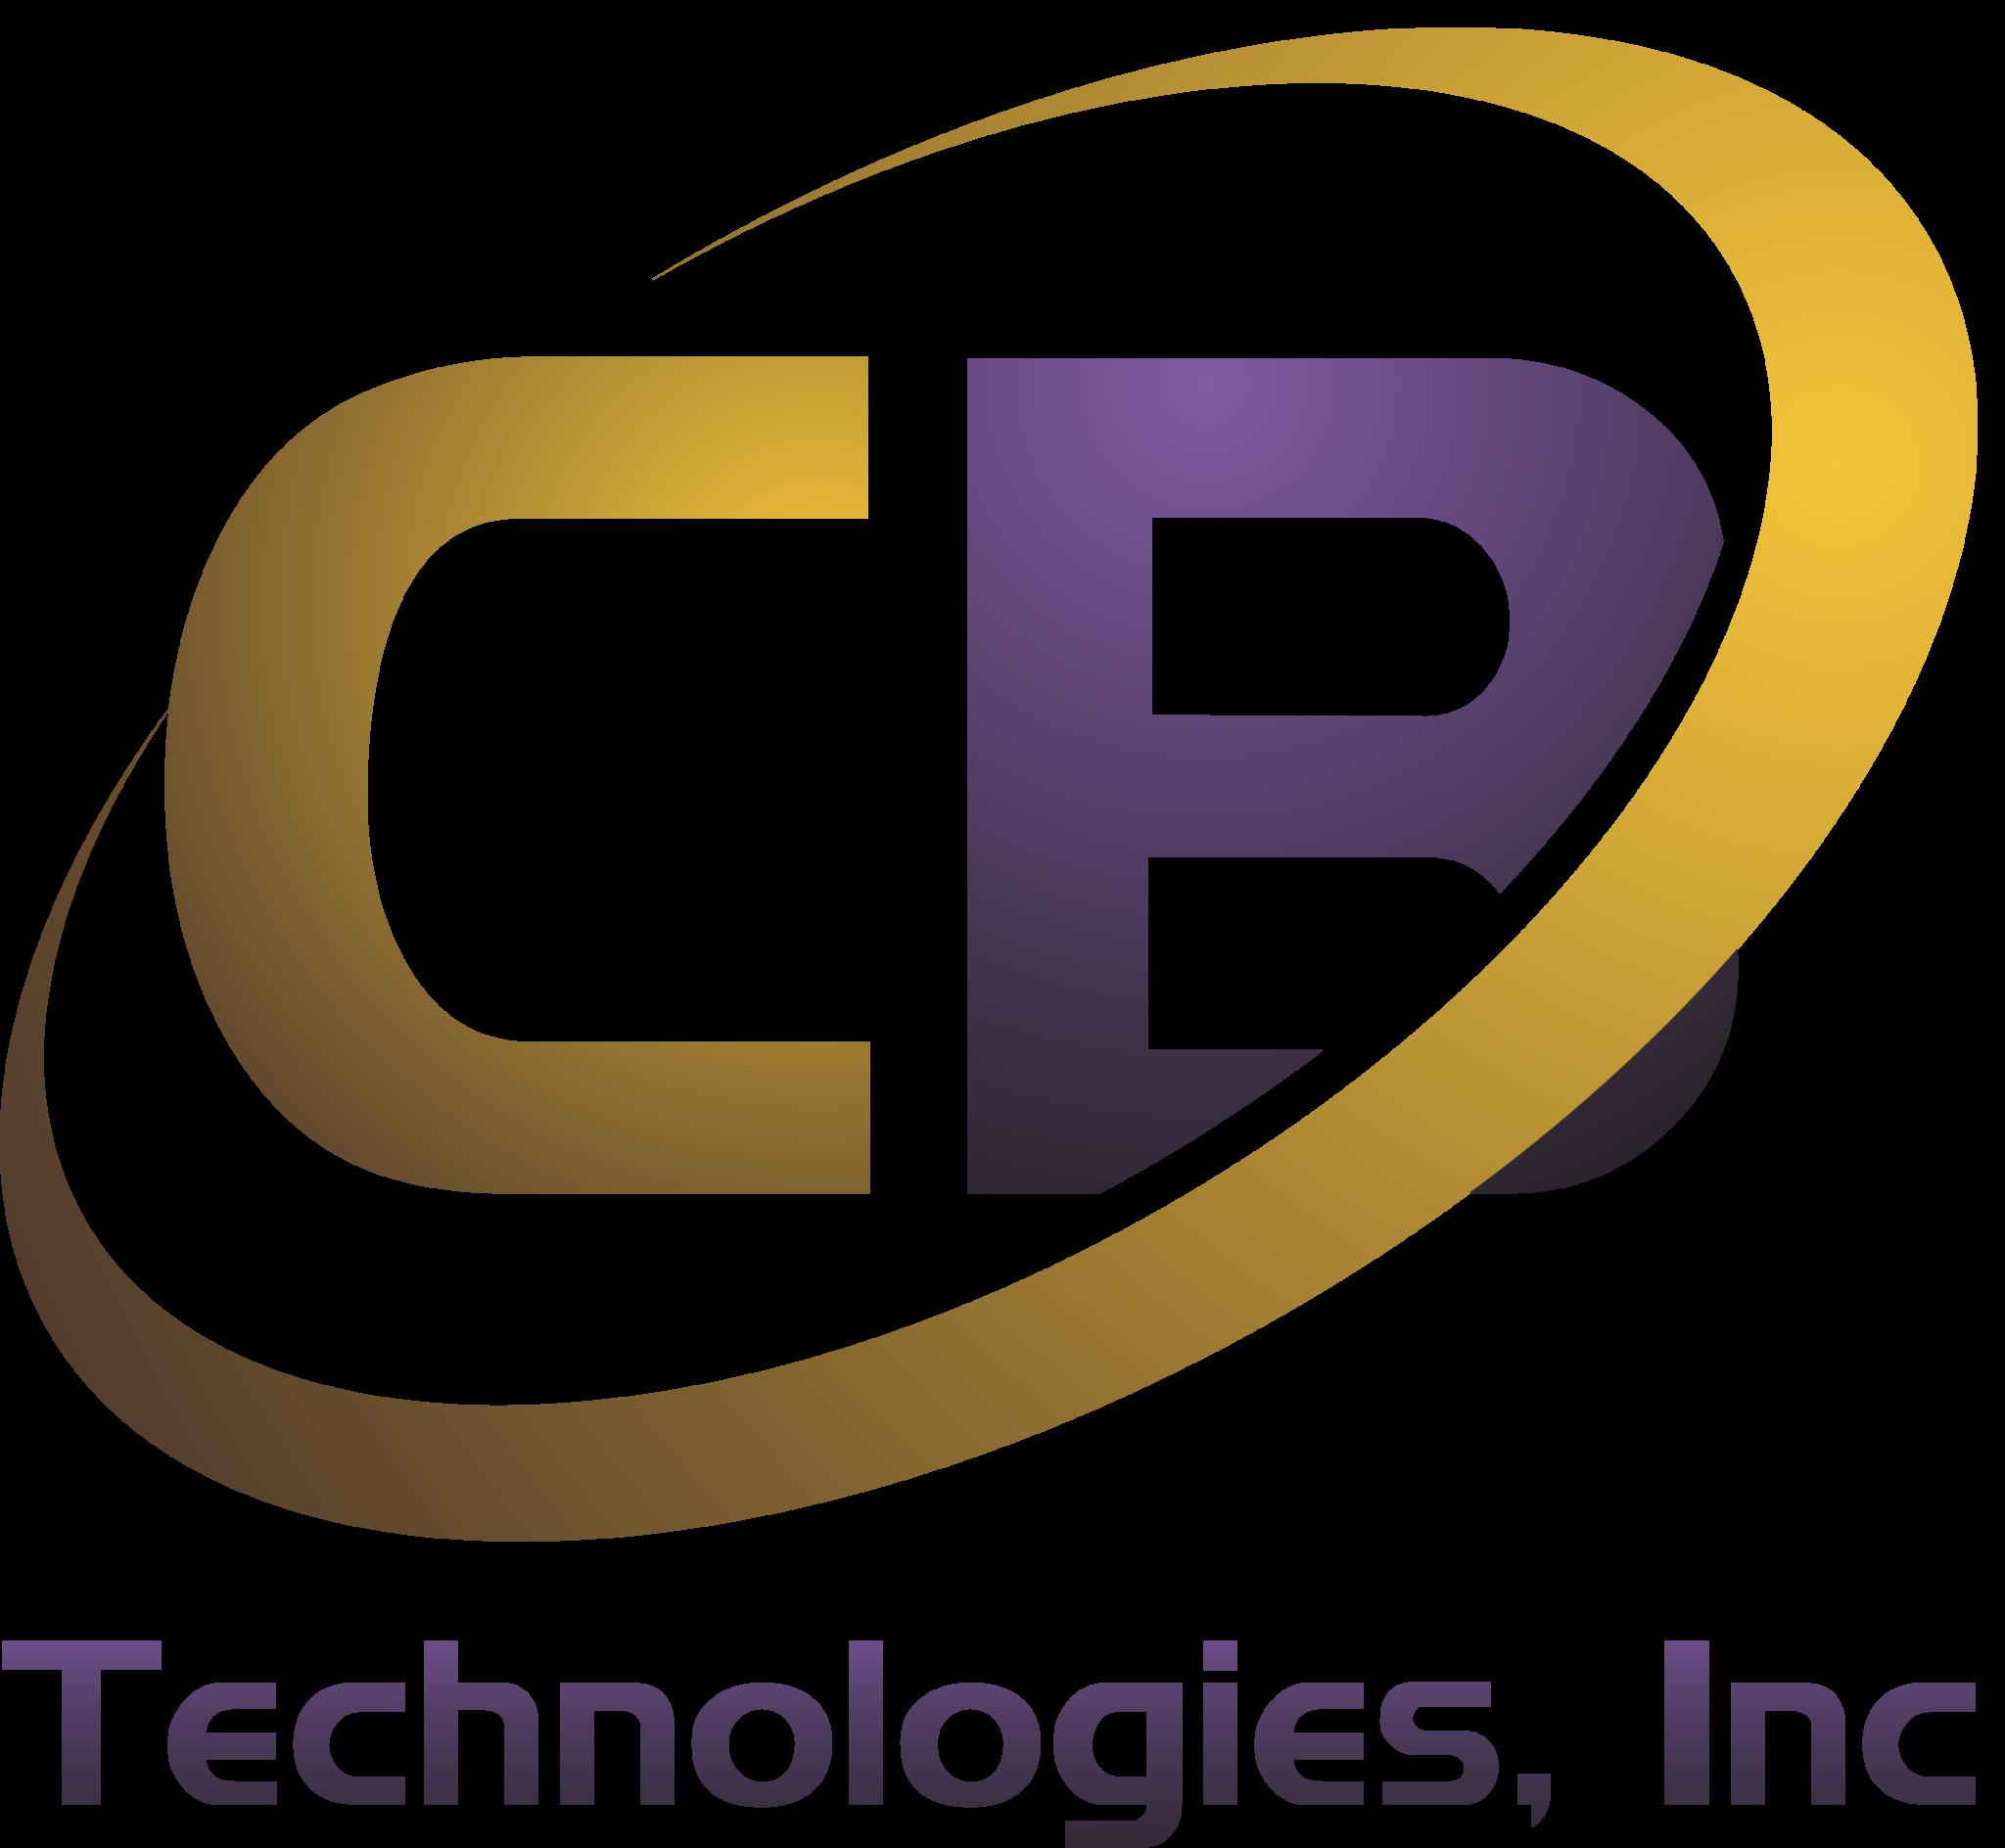 CB Technologies.